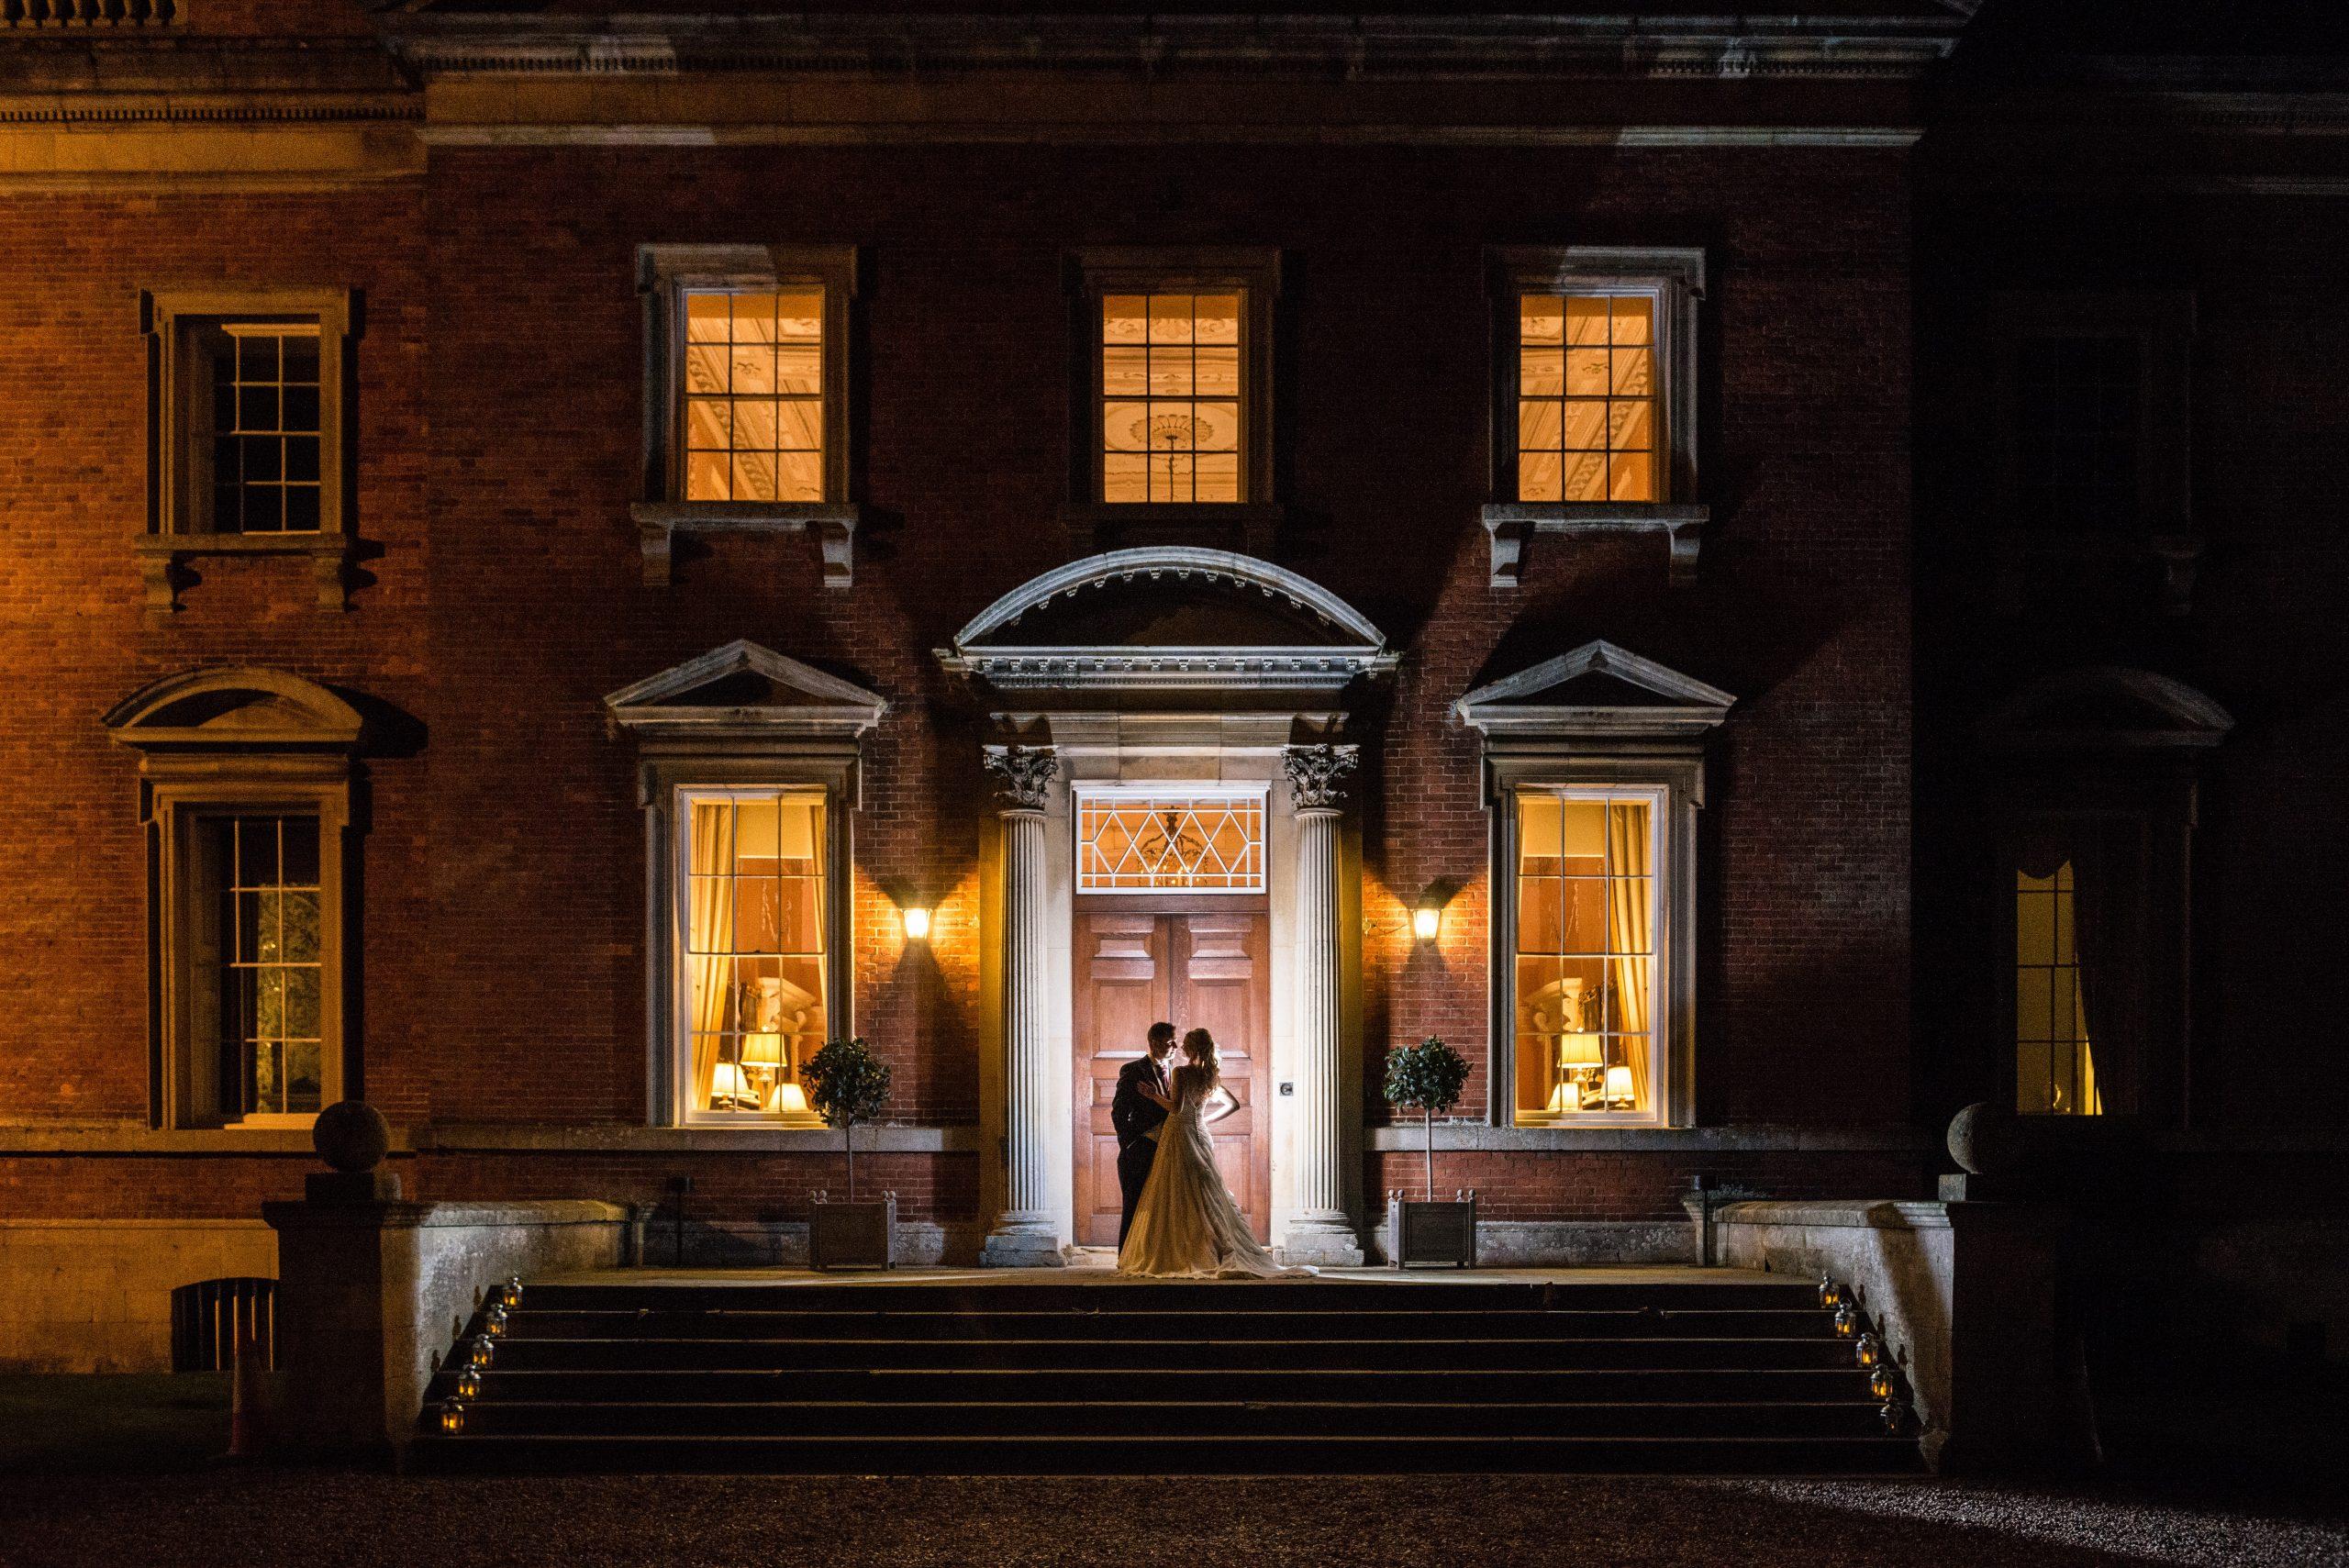 Bride & groom on the front steps of Kelmarsh Hall at night